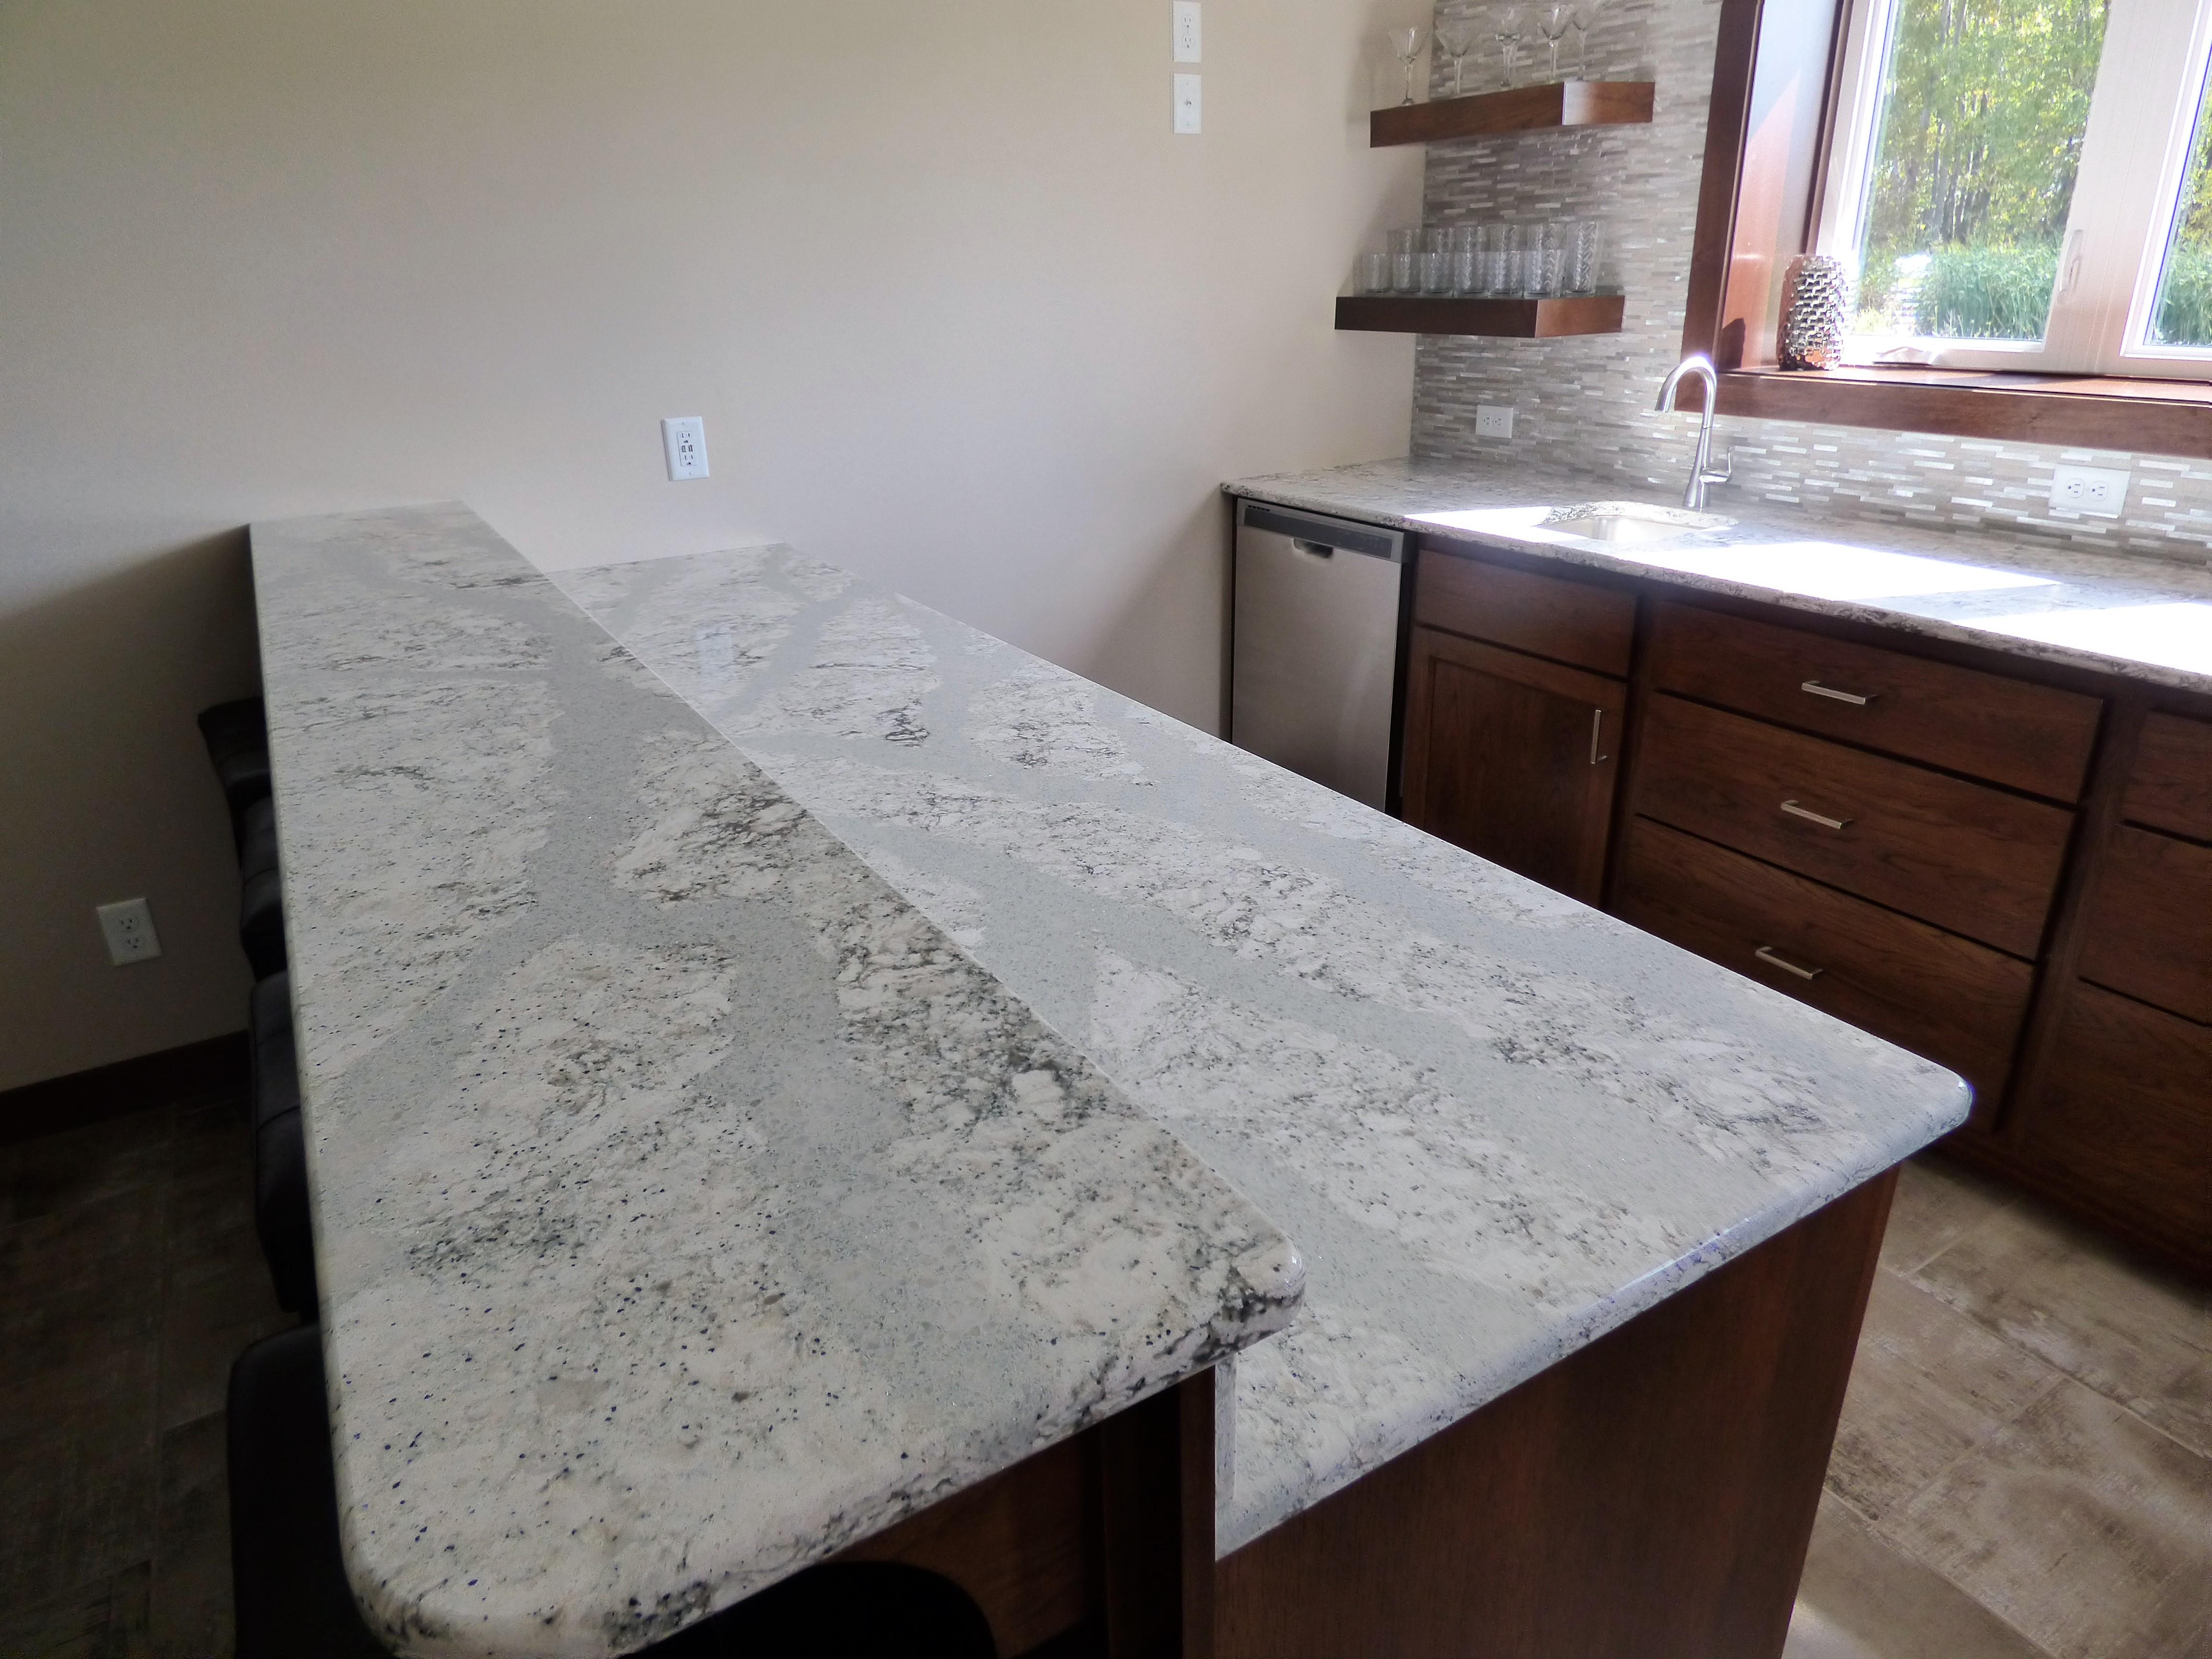 qa green countertops quartz blog countertop a goods cambria kitchen q with guildford wa